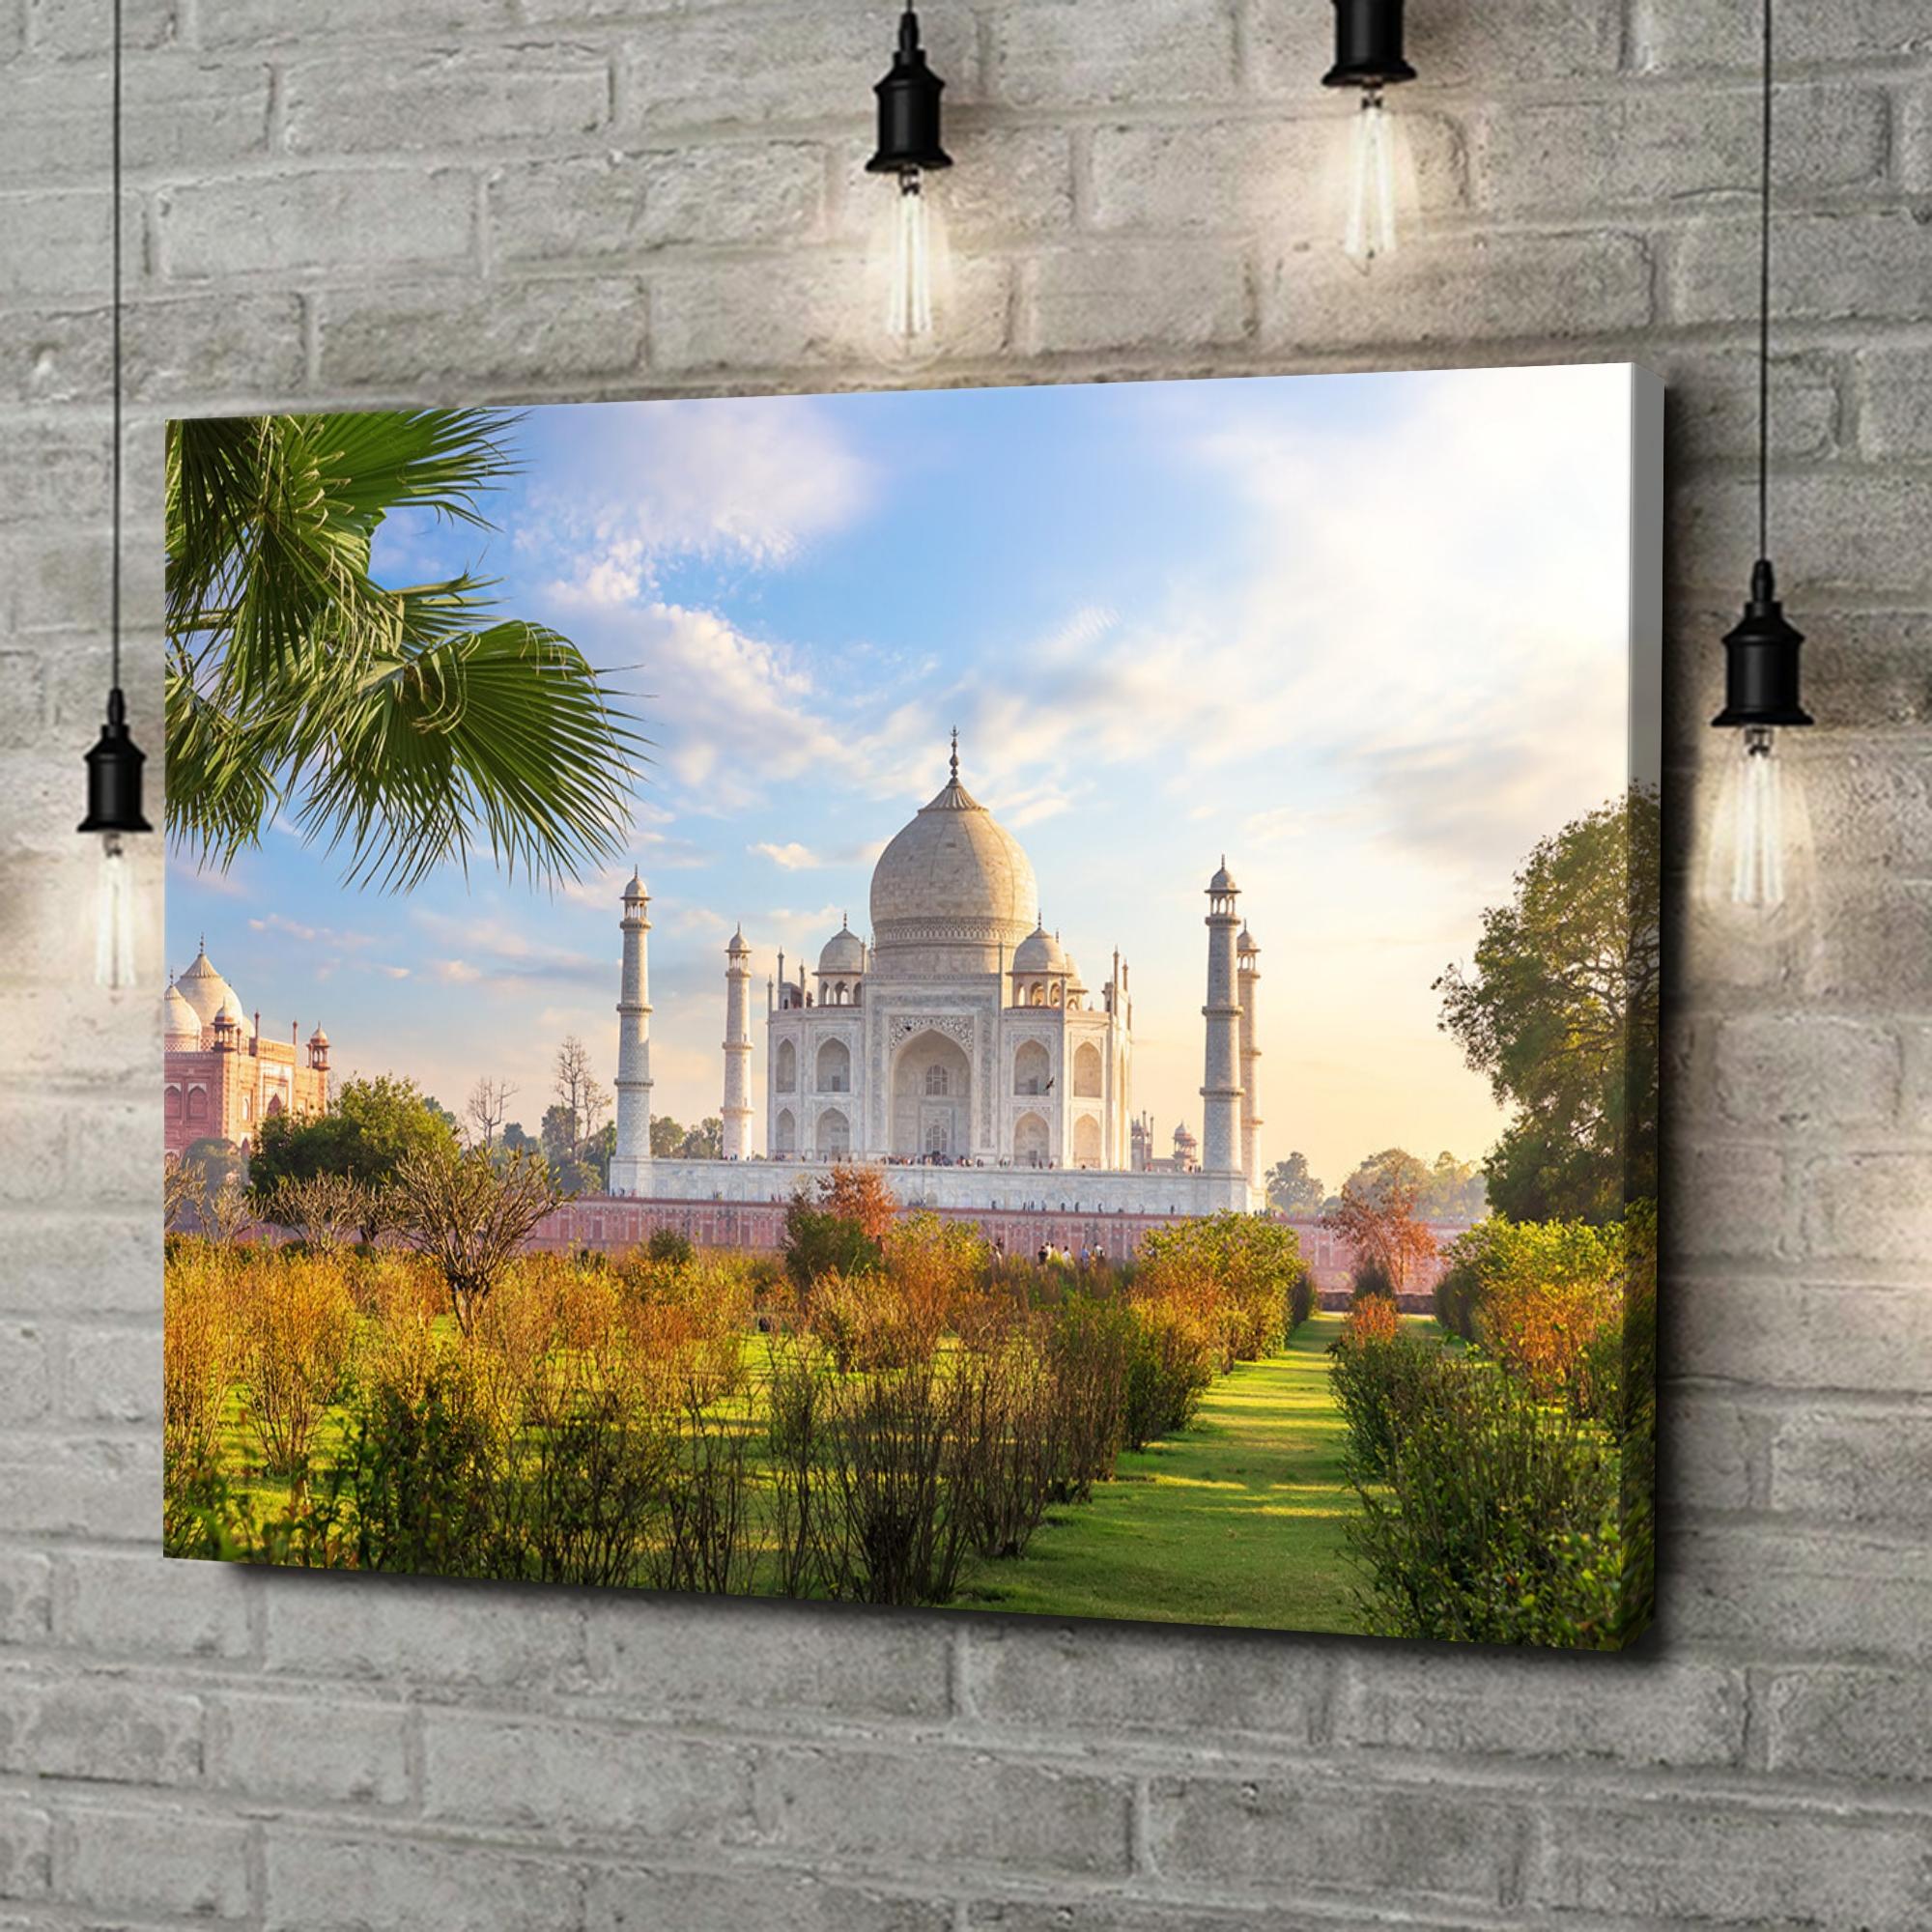 Leinwandbild personalisiert Taj Mahal Indien 2